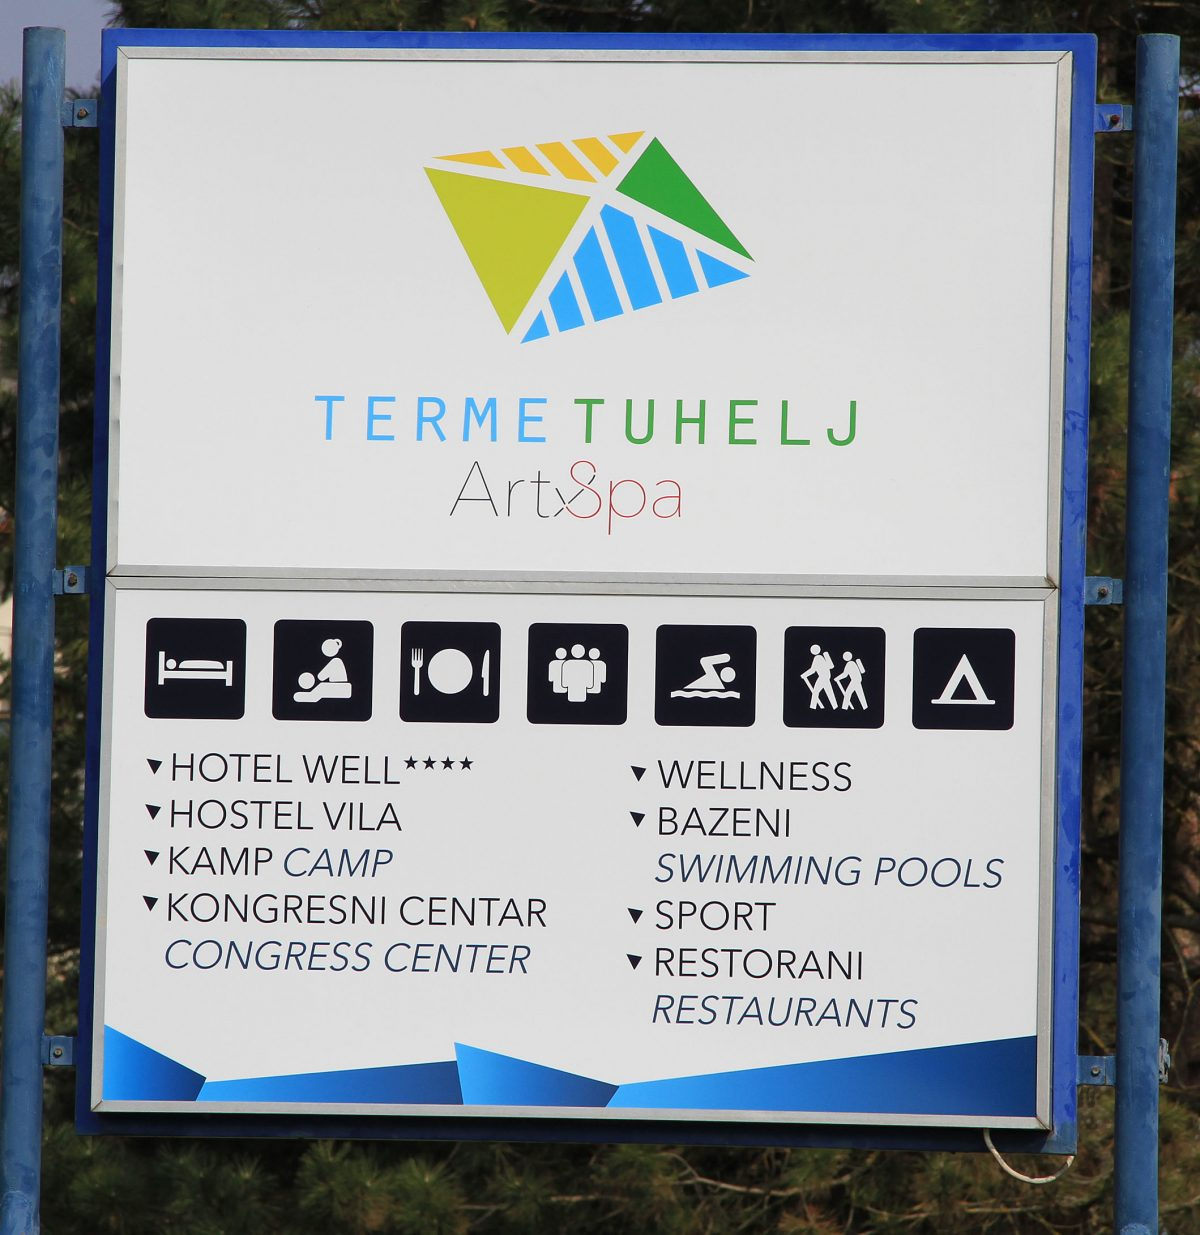 Terme Tuhelj - Spa swimming pools